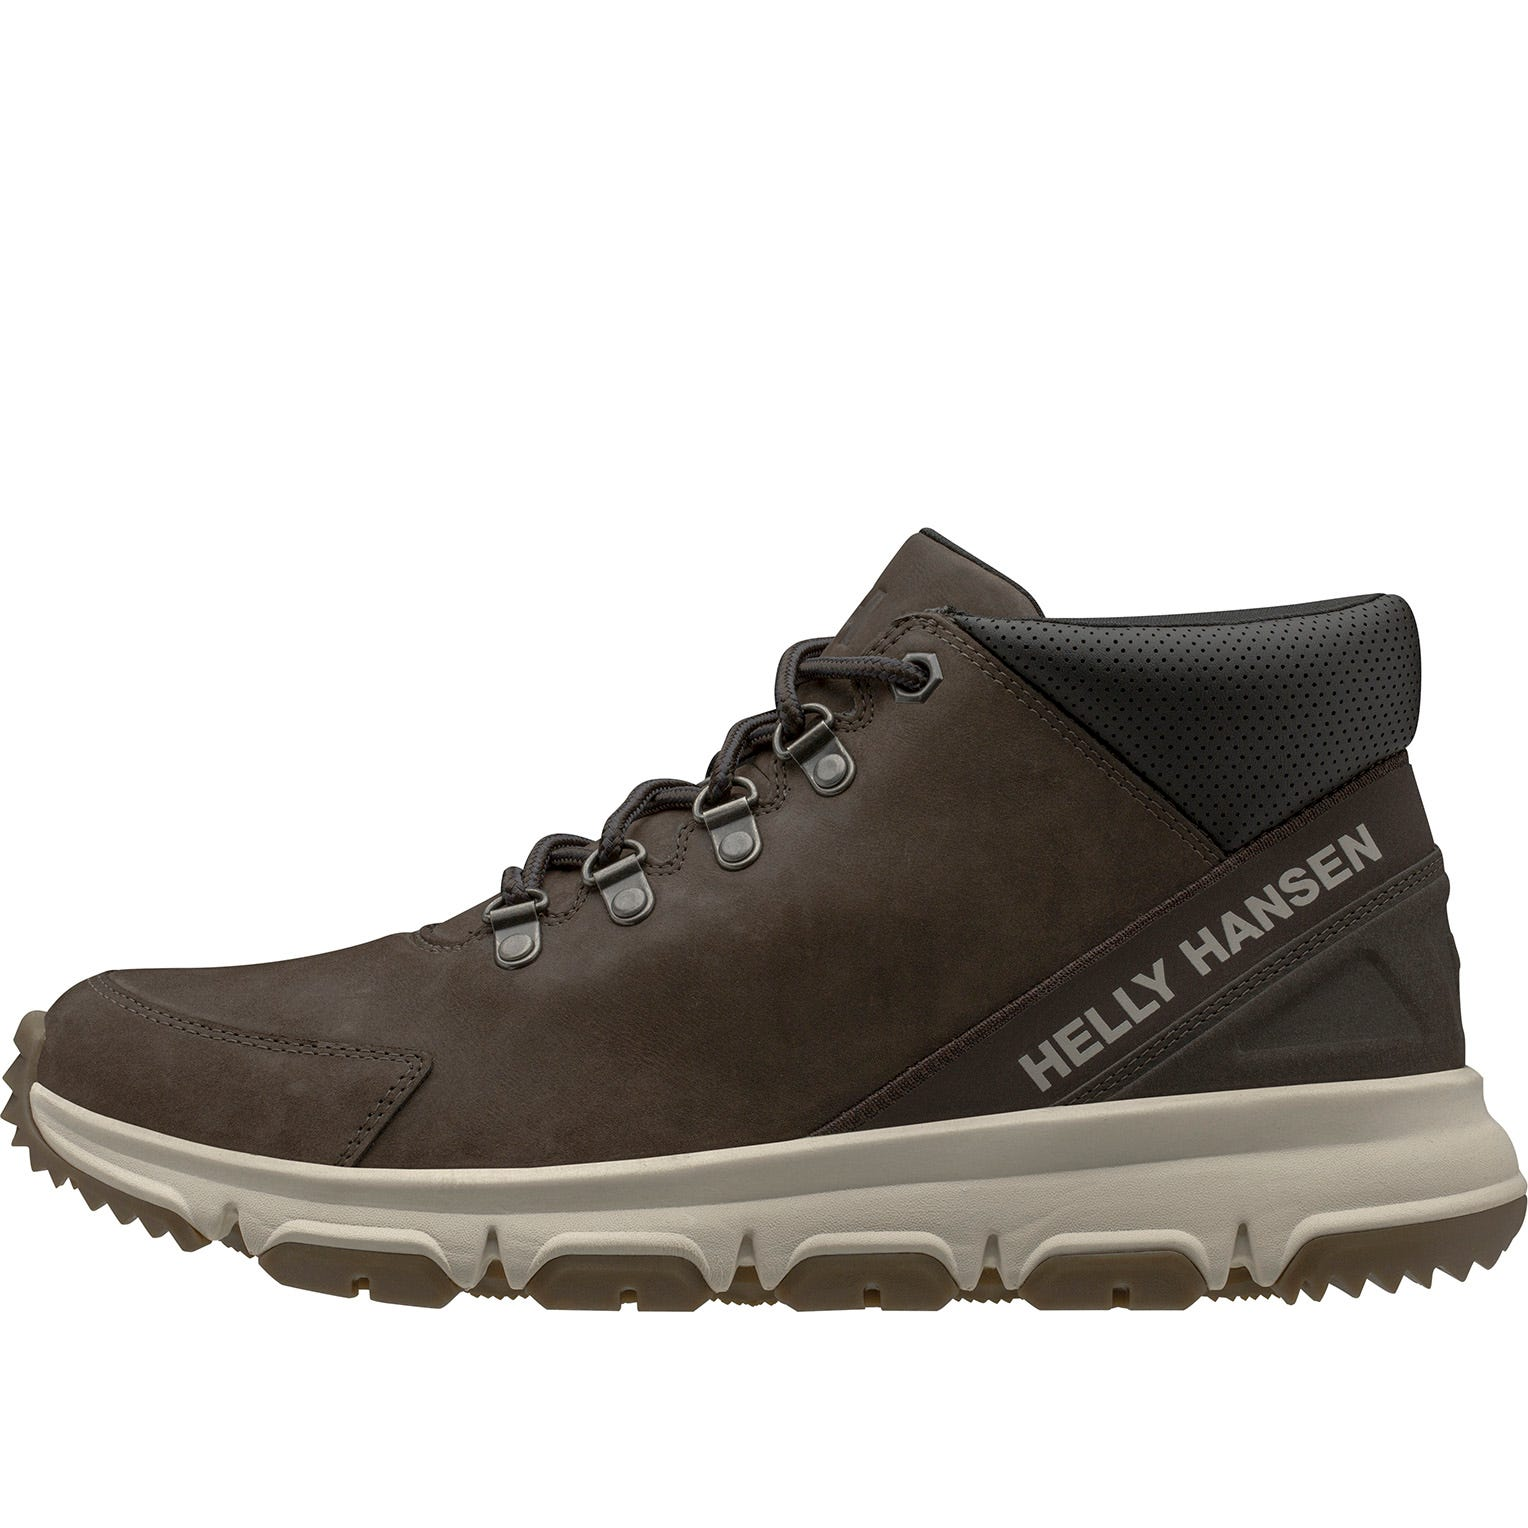 Helly Hansen Mens Fendvard Waterproof Leather Boots 12.5